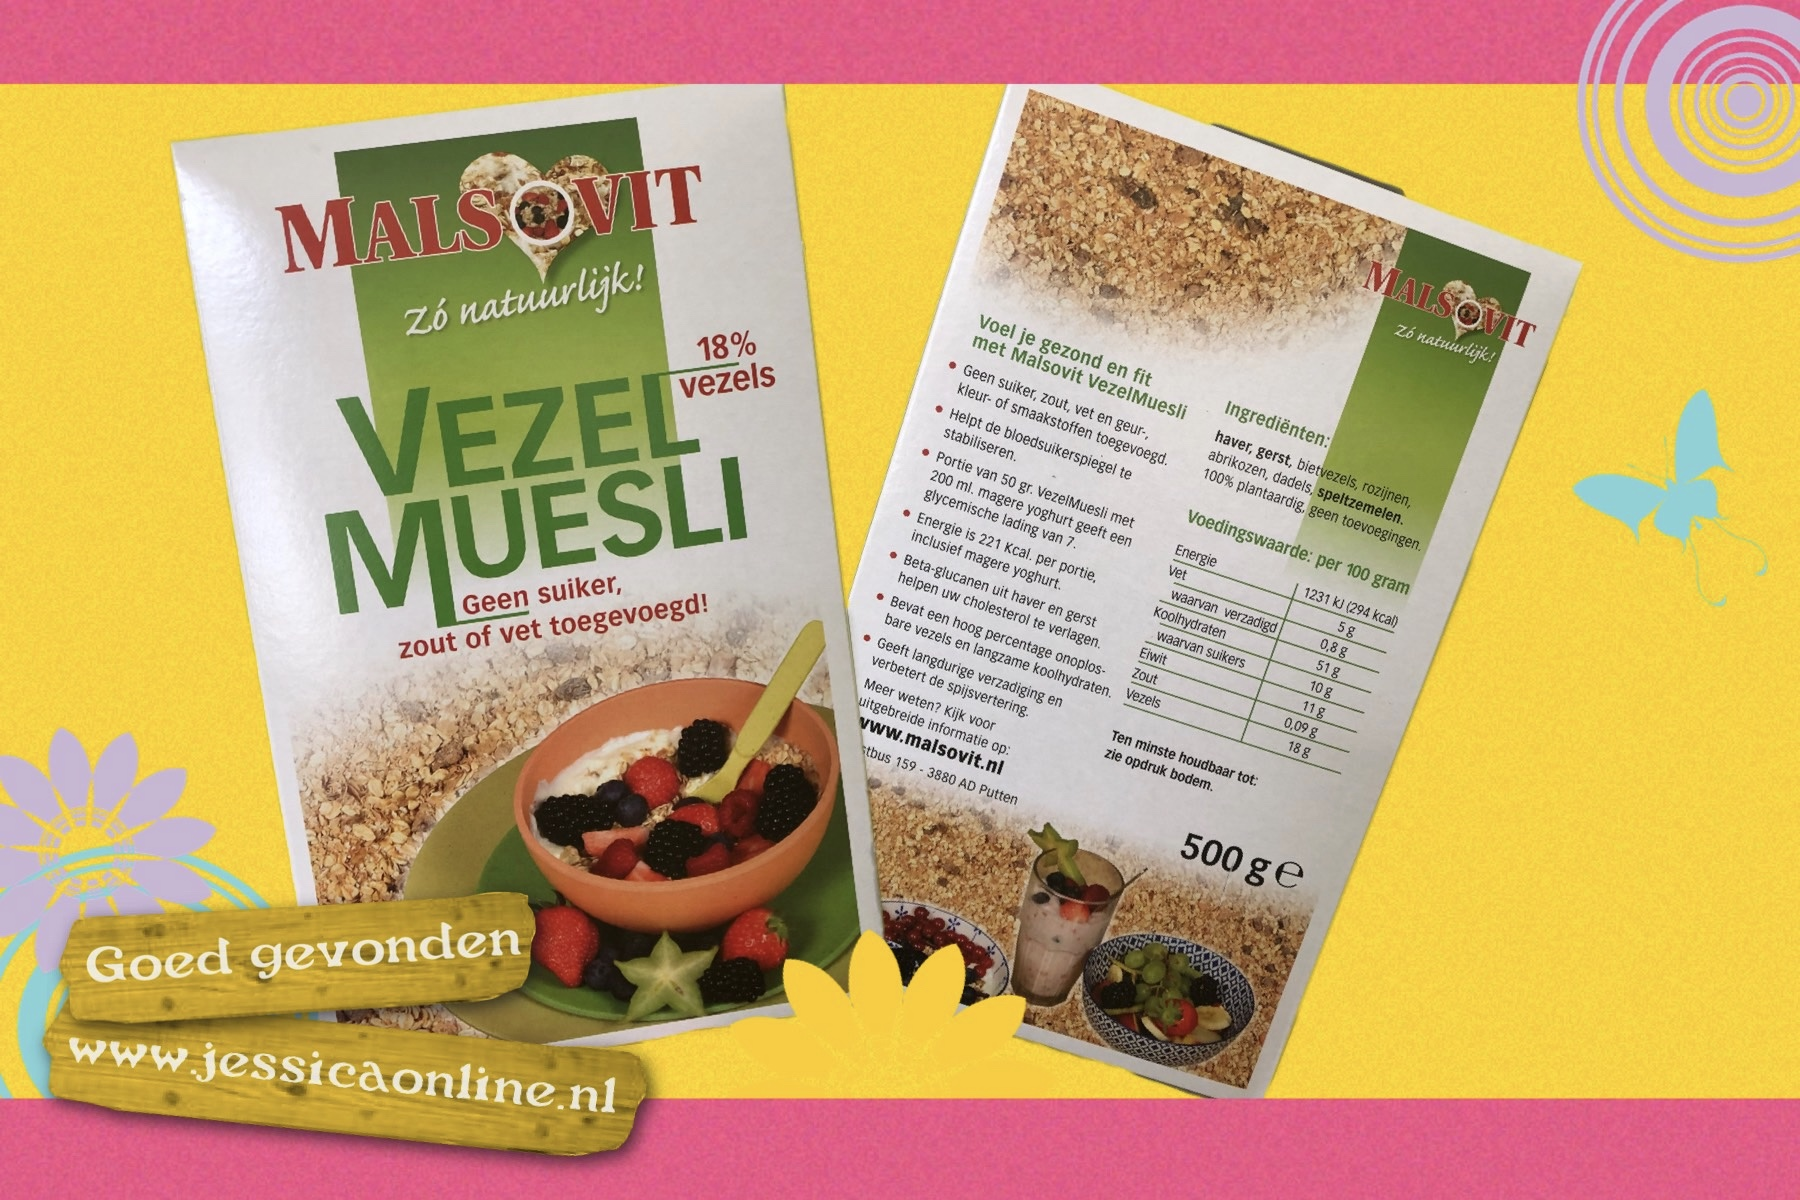 Vezel muesli Malsovit - JessicaOnline.nl